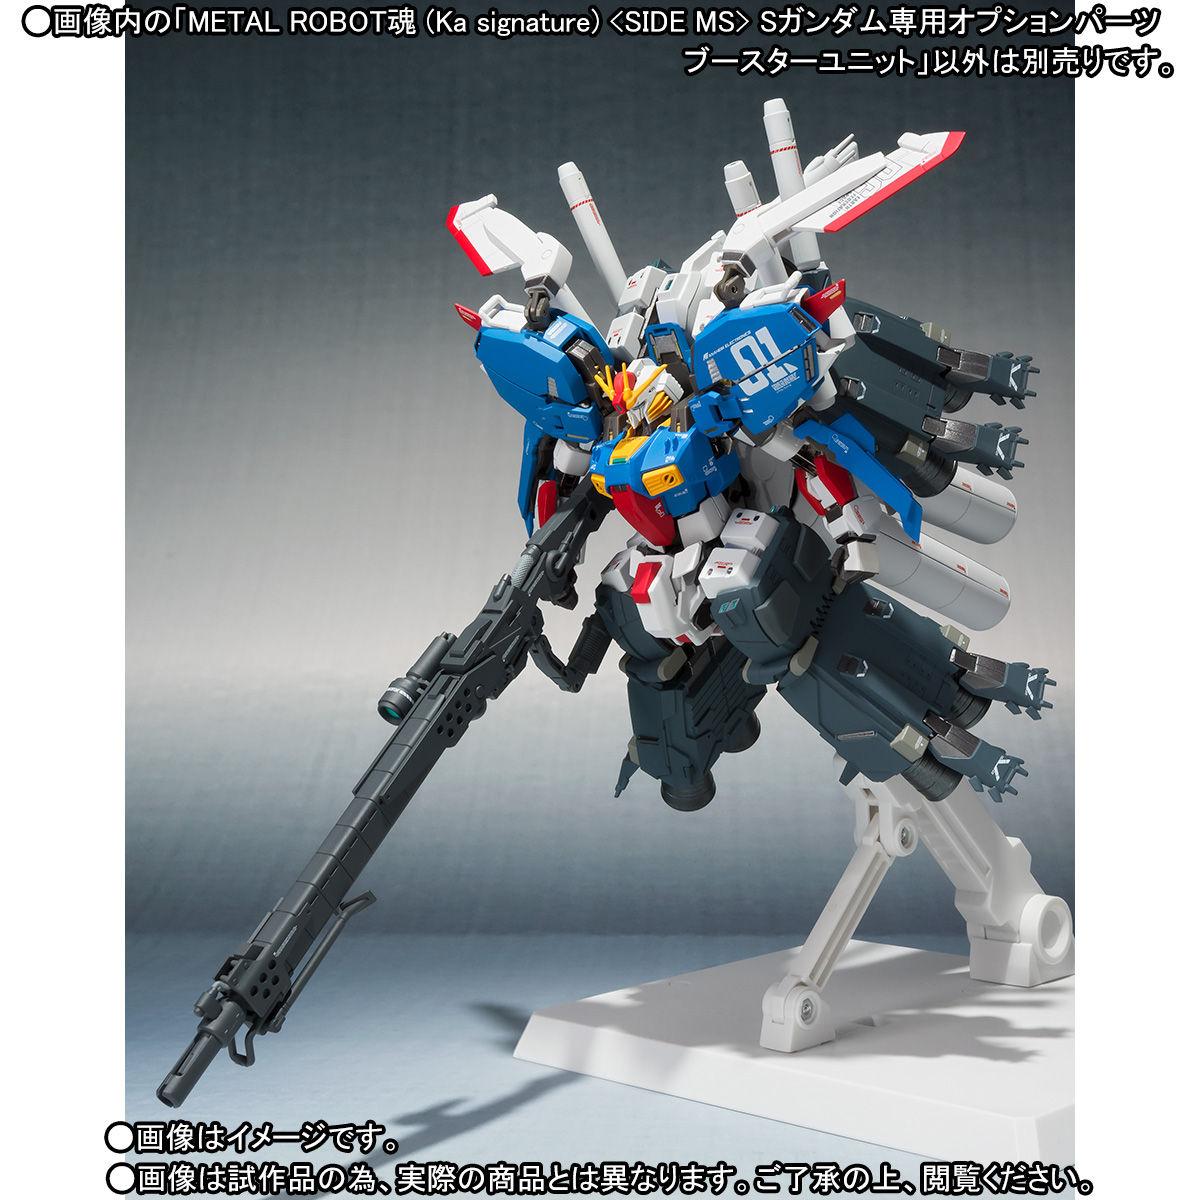 METAL ROBOT魂(Ka signature)<SIDE MS>『Sガンダム専用オプションパーツ ブースターユニット』オプションパーツ-002